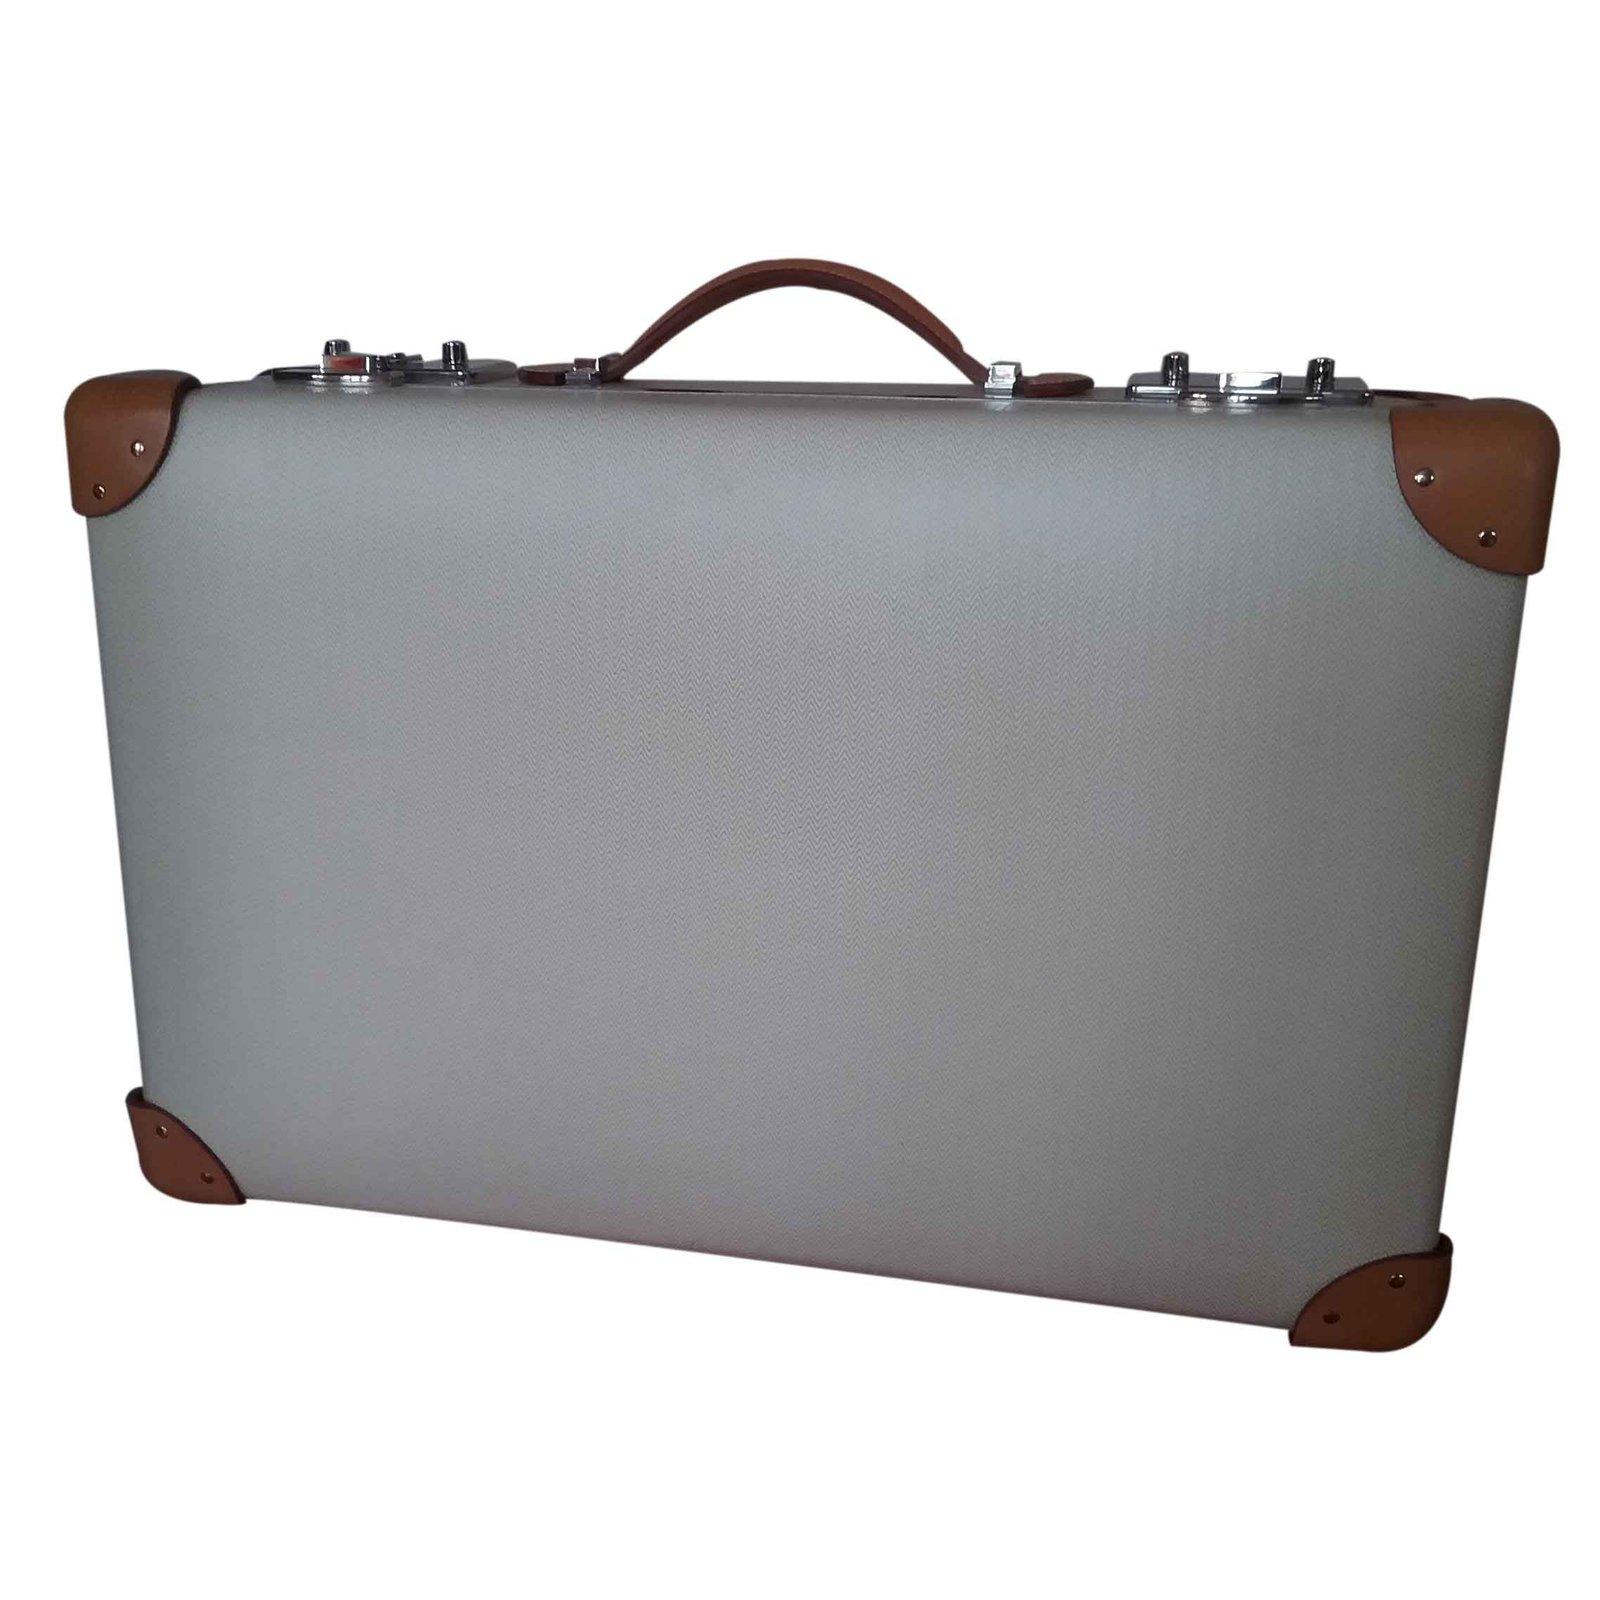 sacs de voyage herm s valise cuir beige joli closet. Black Bedroom Furniture Sets. Home Design Ideas